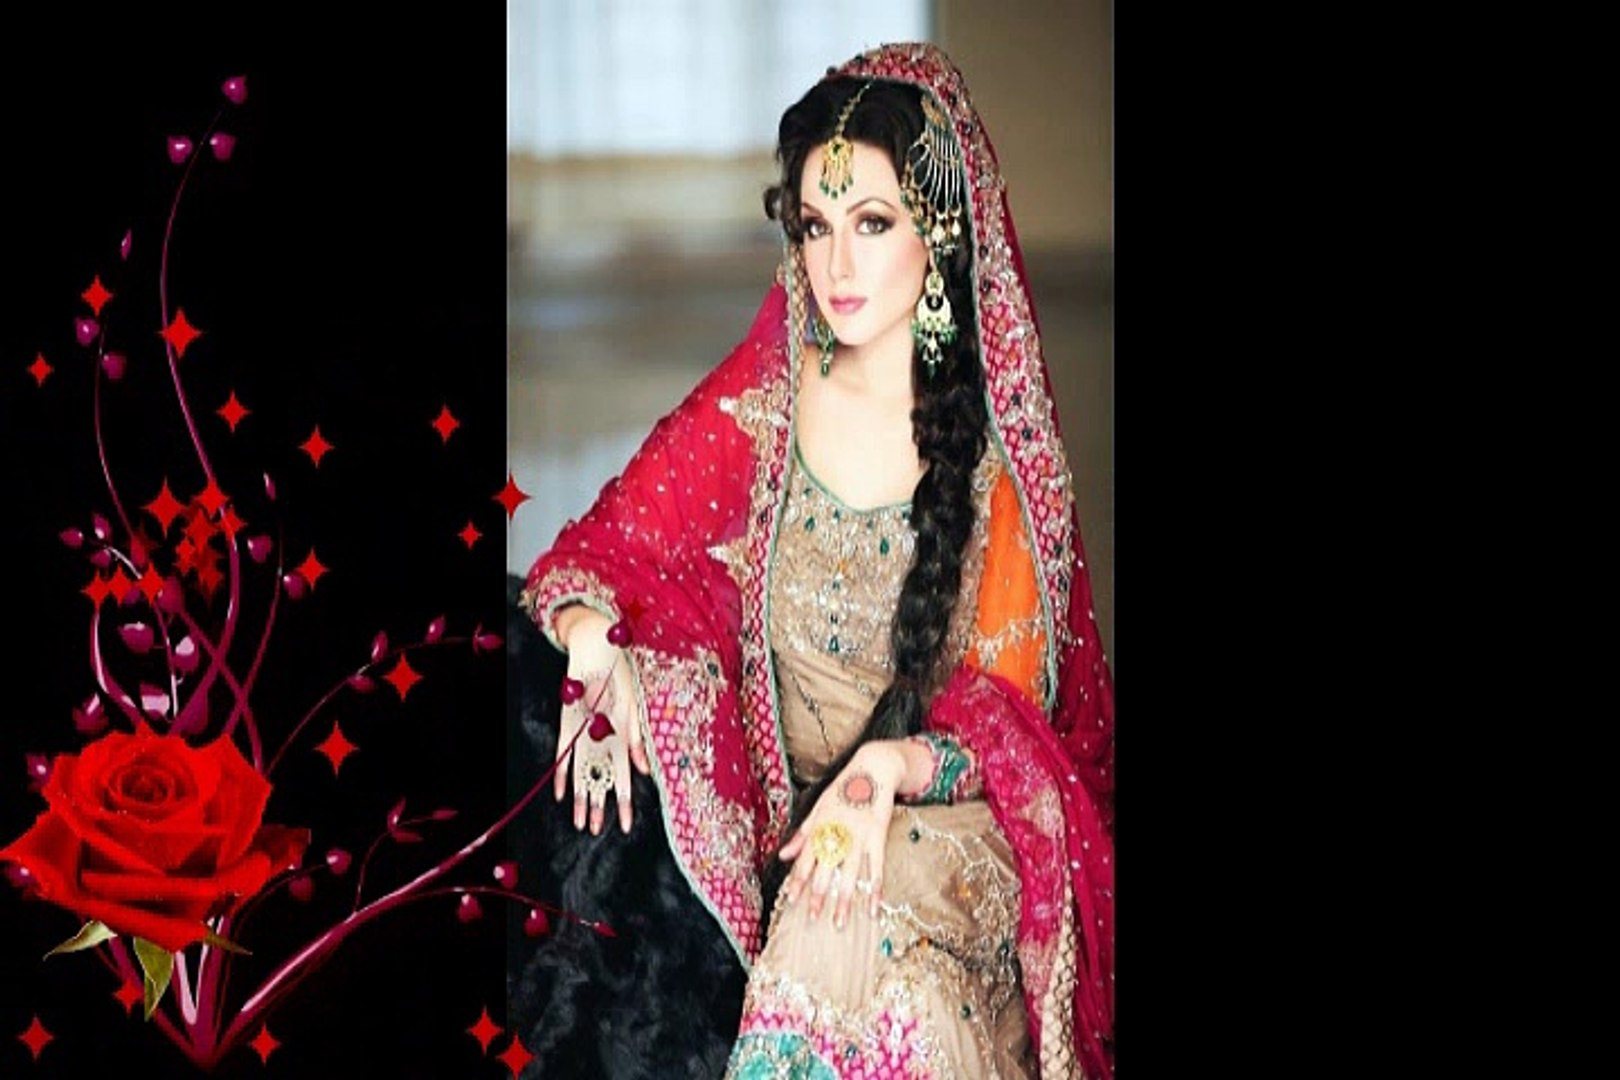 Most Beautiful Indian Wedding Bridal Hairstyles, Indian Wedding Hairstyles For Beautiful Women #1